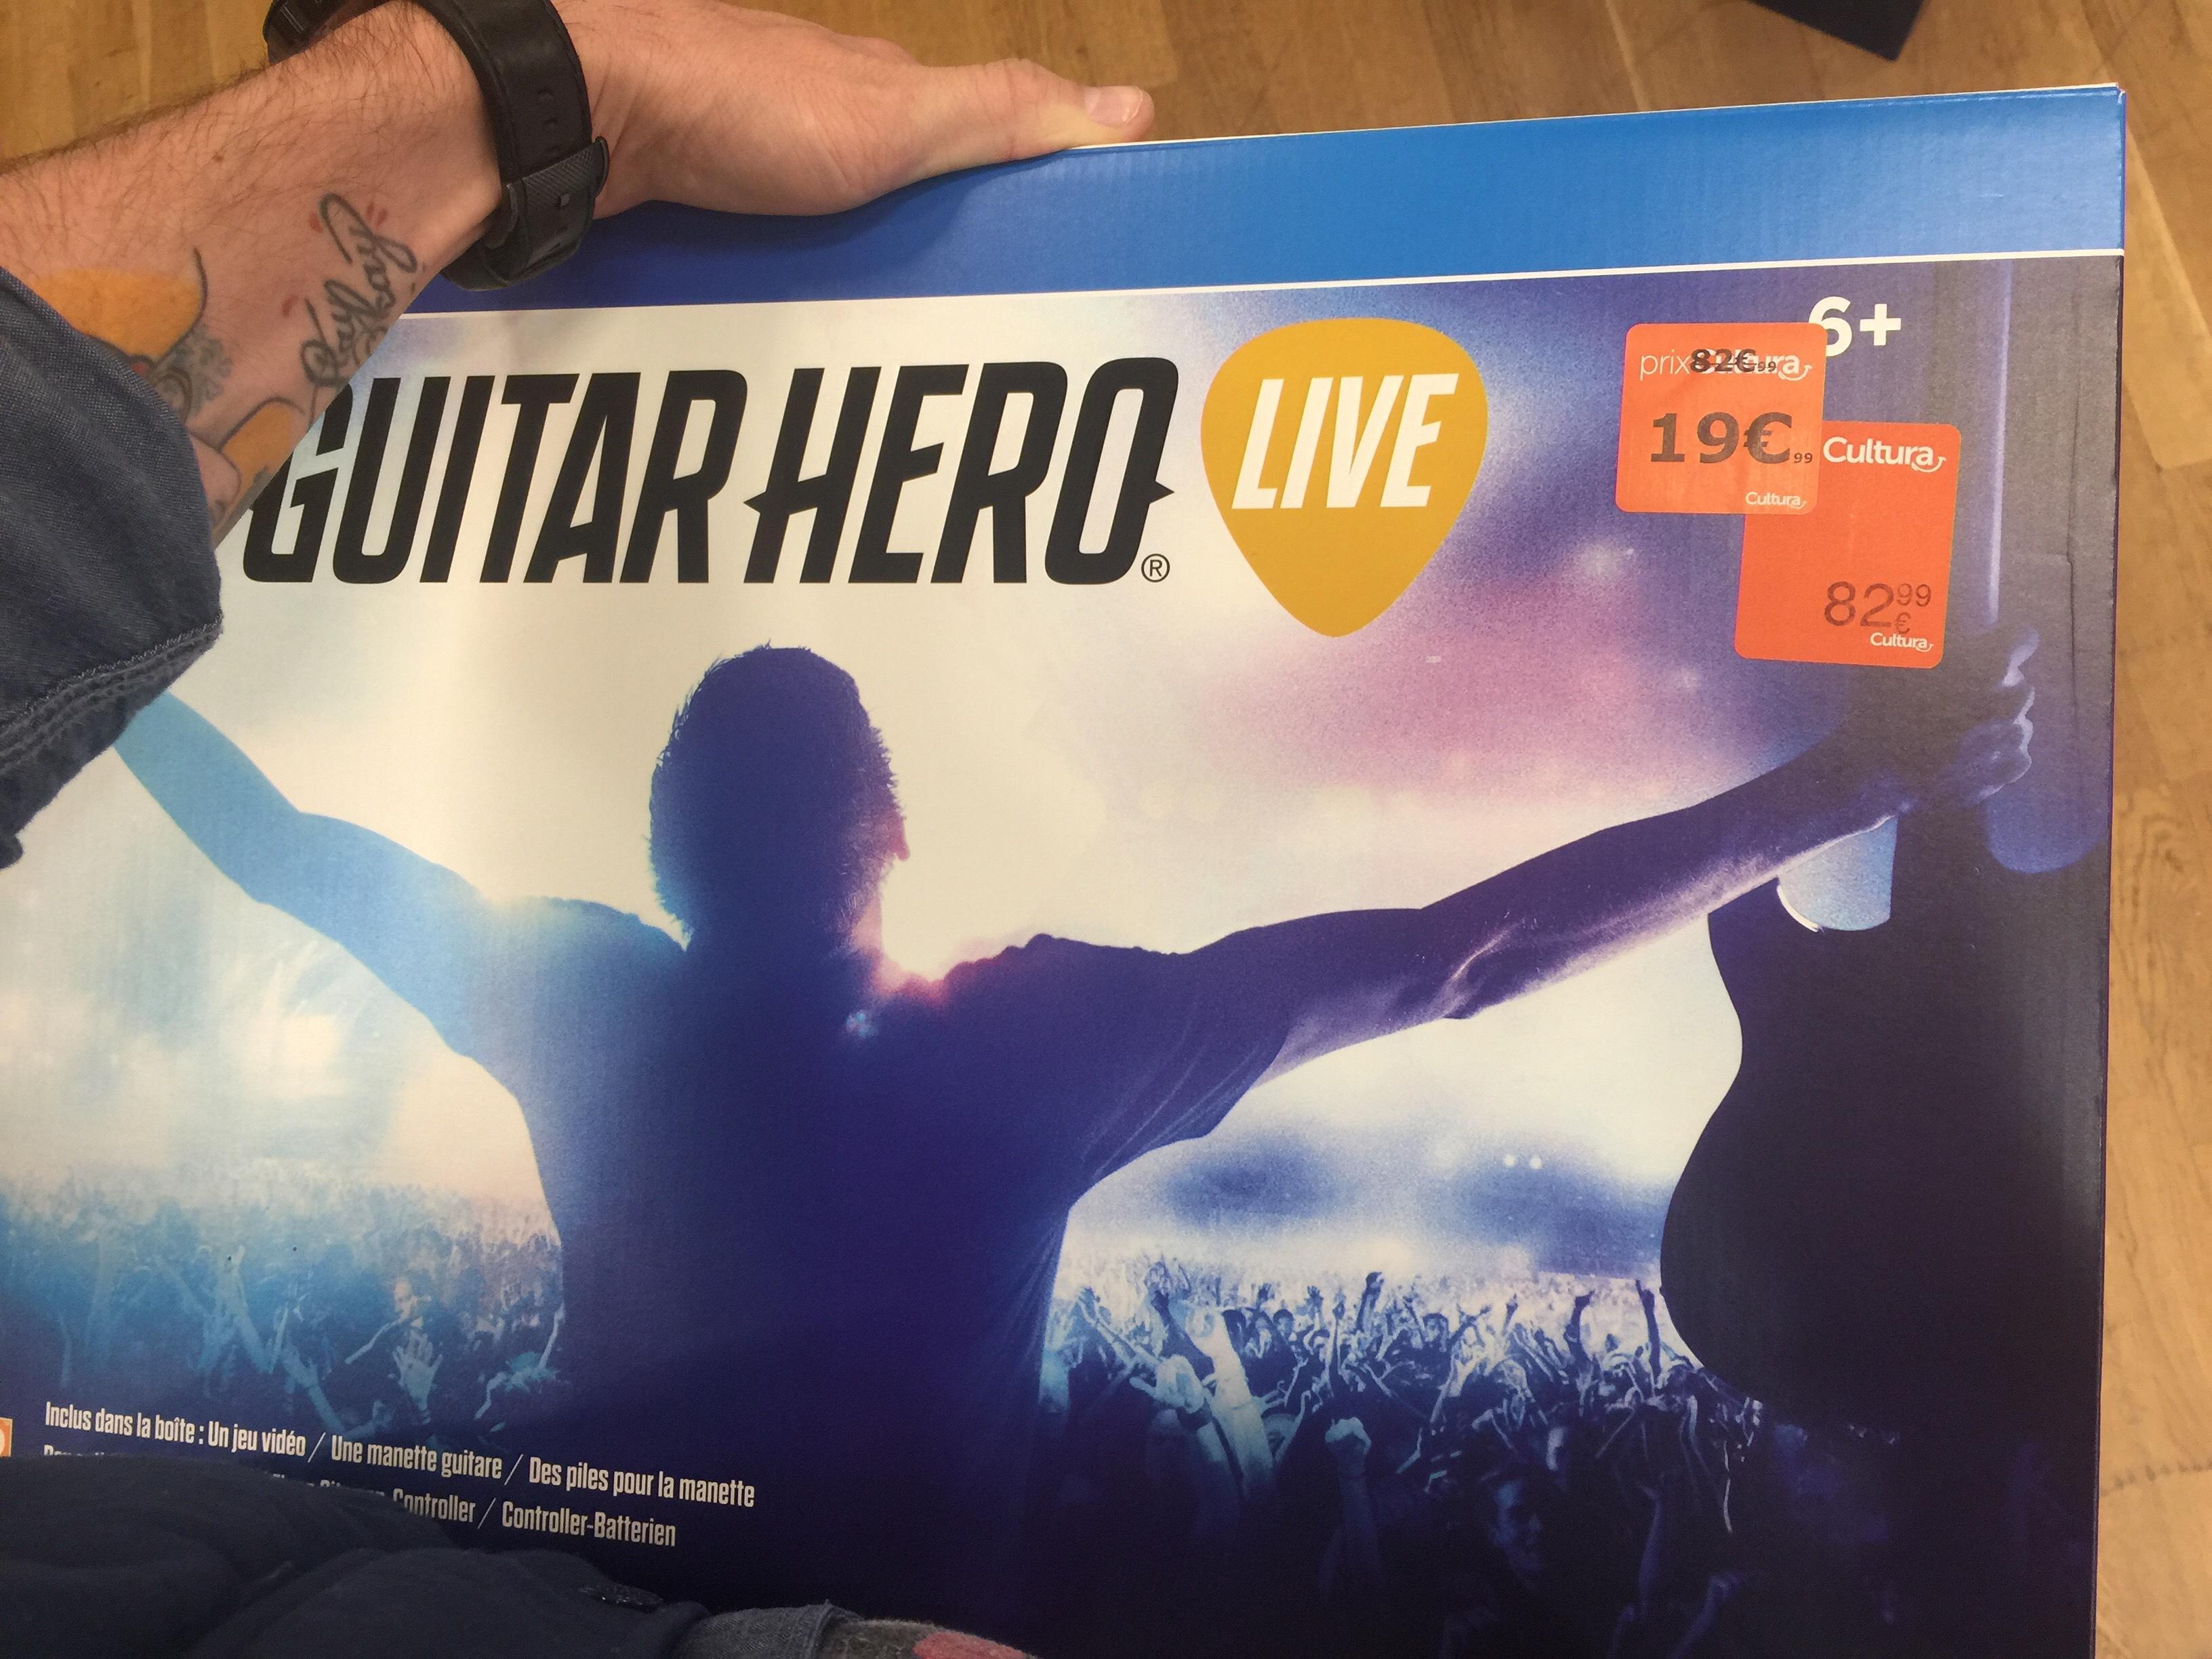 Guitare Hero Live sur PS4, Xbox One, Wii U, PS3 et Xbox 360